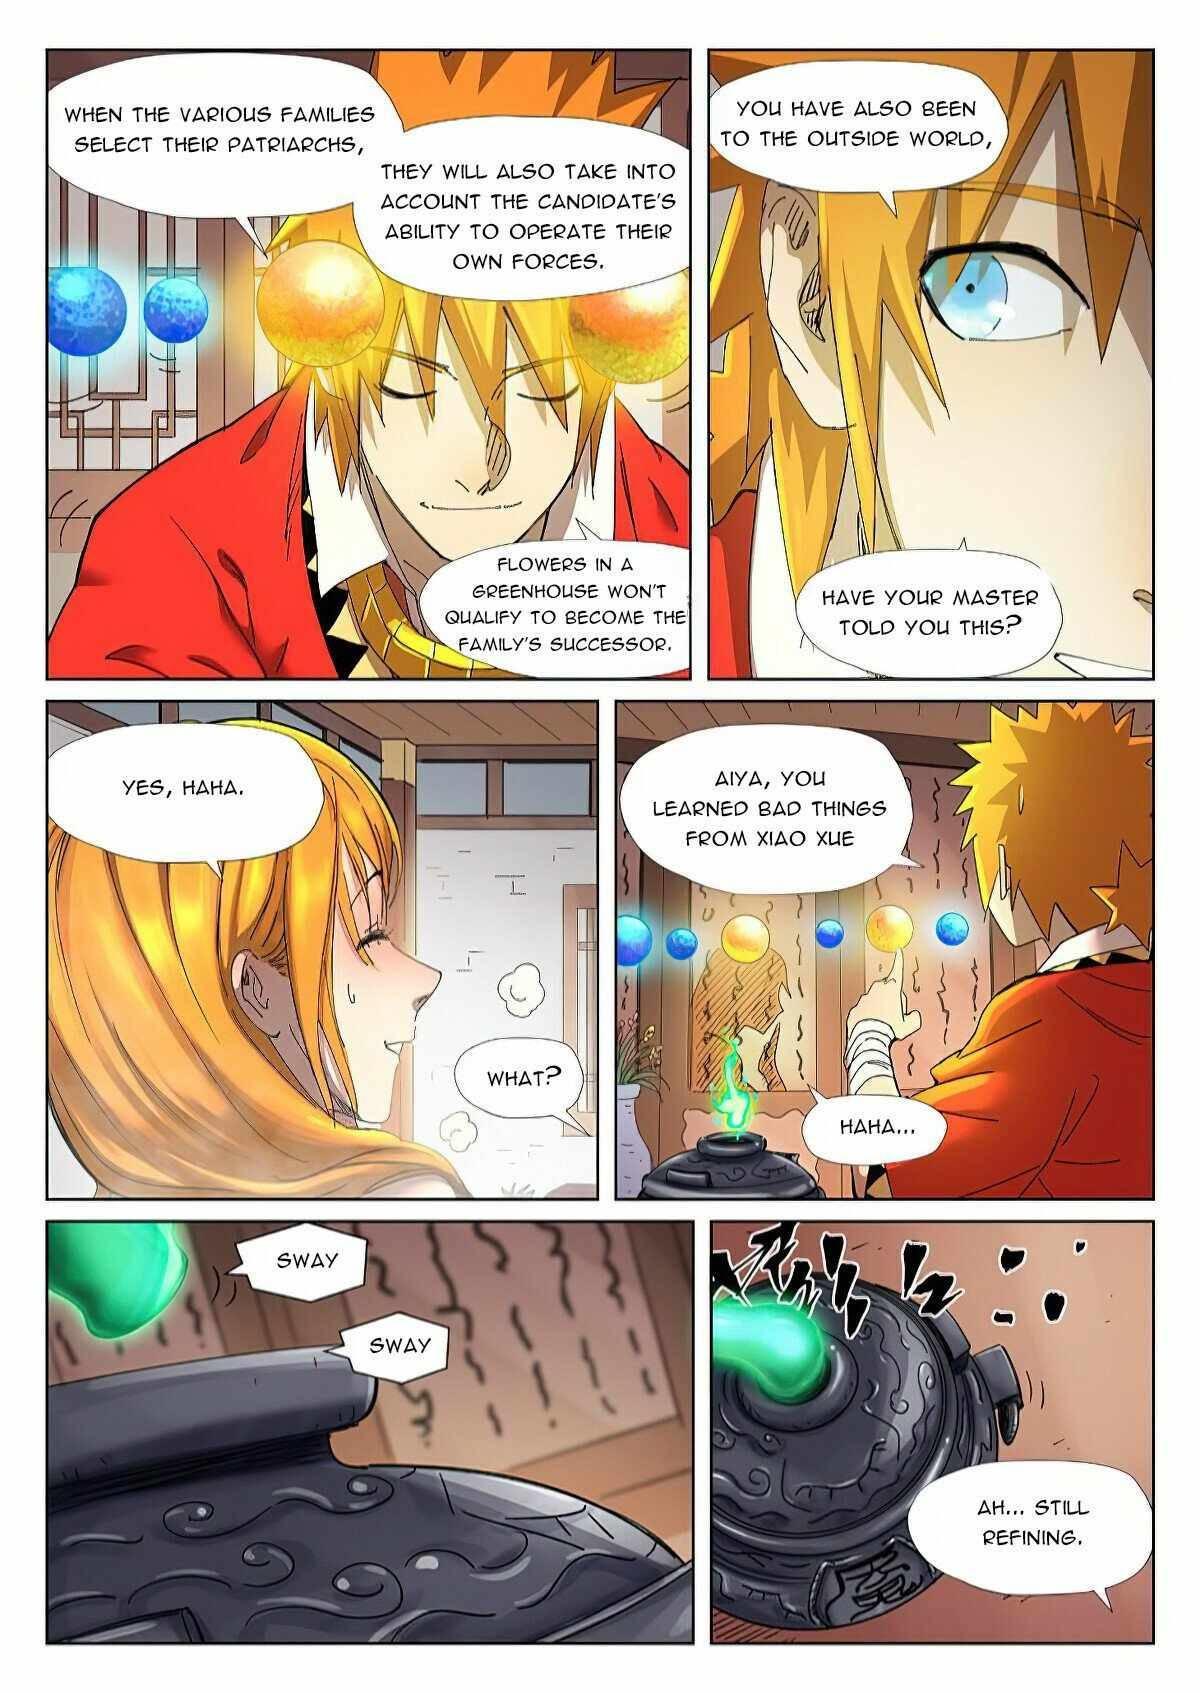 Tales Of Demons And Gods Chapter 343.5 page 6 - Mangakakalot